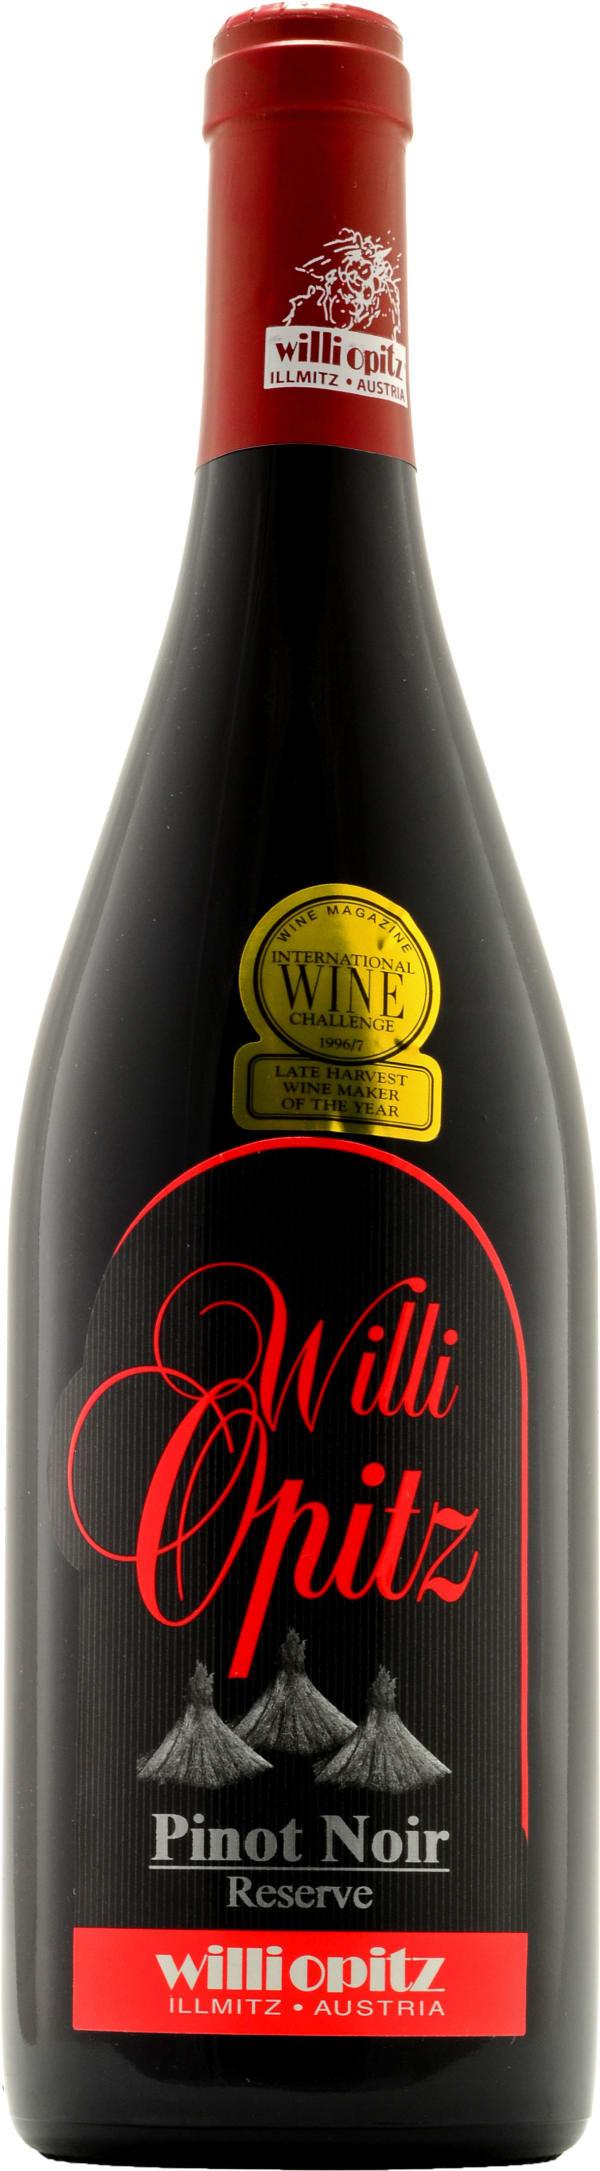 Willi Opitz Pinot Noir Reserve 2011